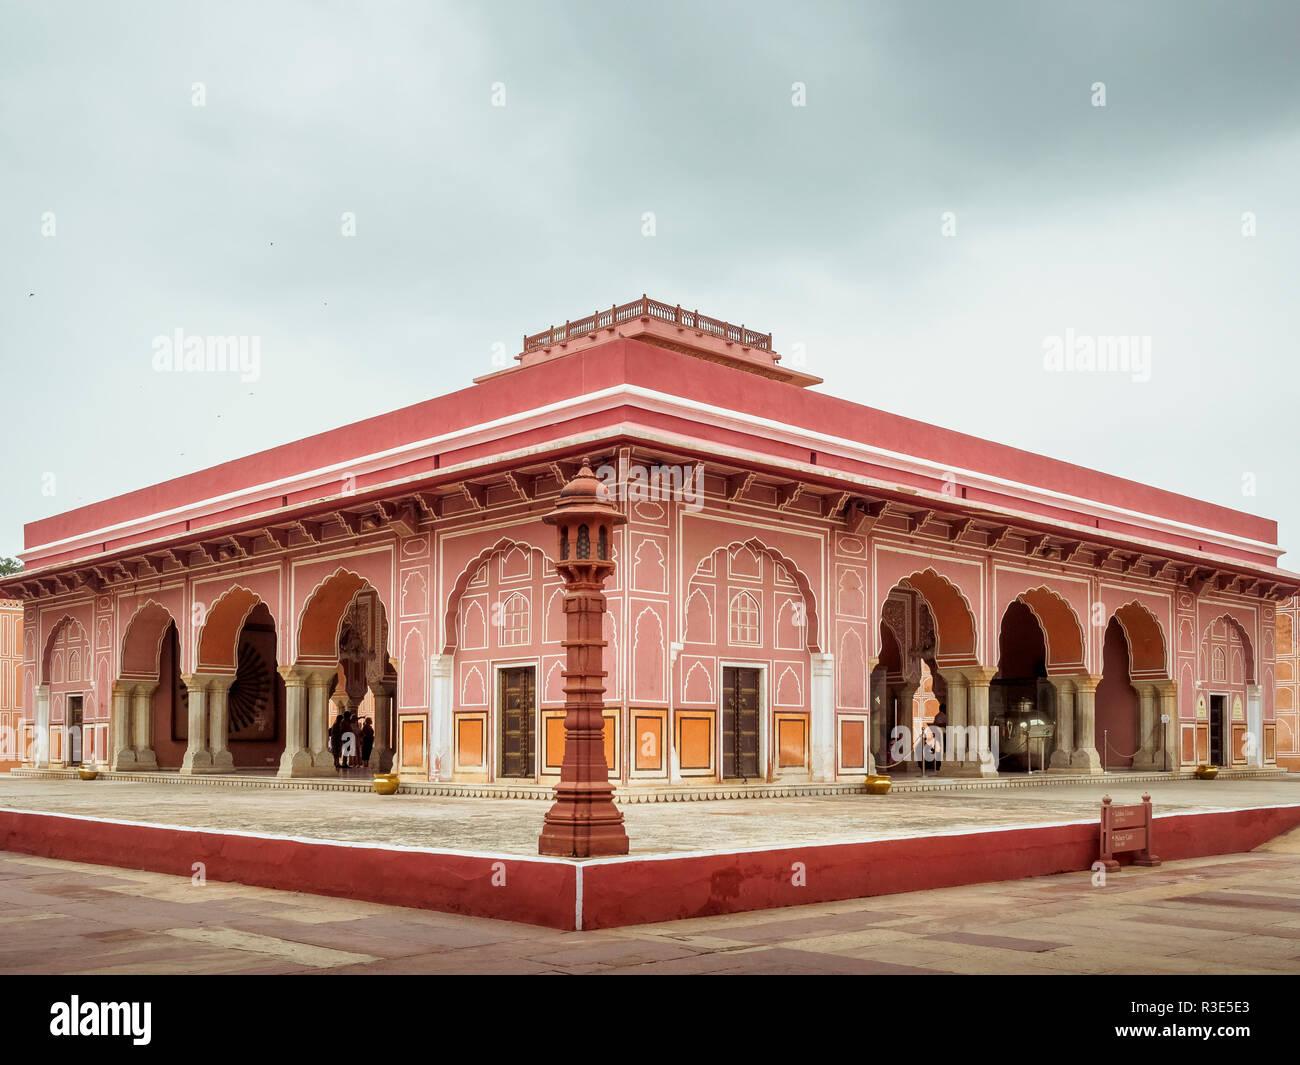 City Palace in Pink City Jaipur, Rajasthan, India - Stock Image